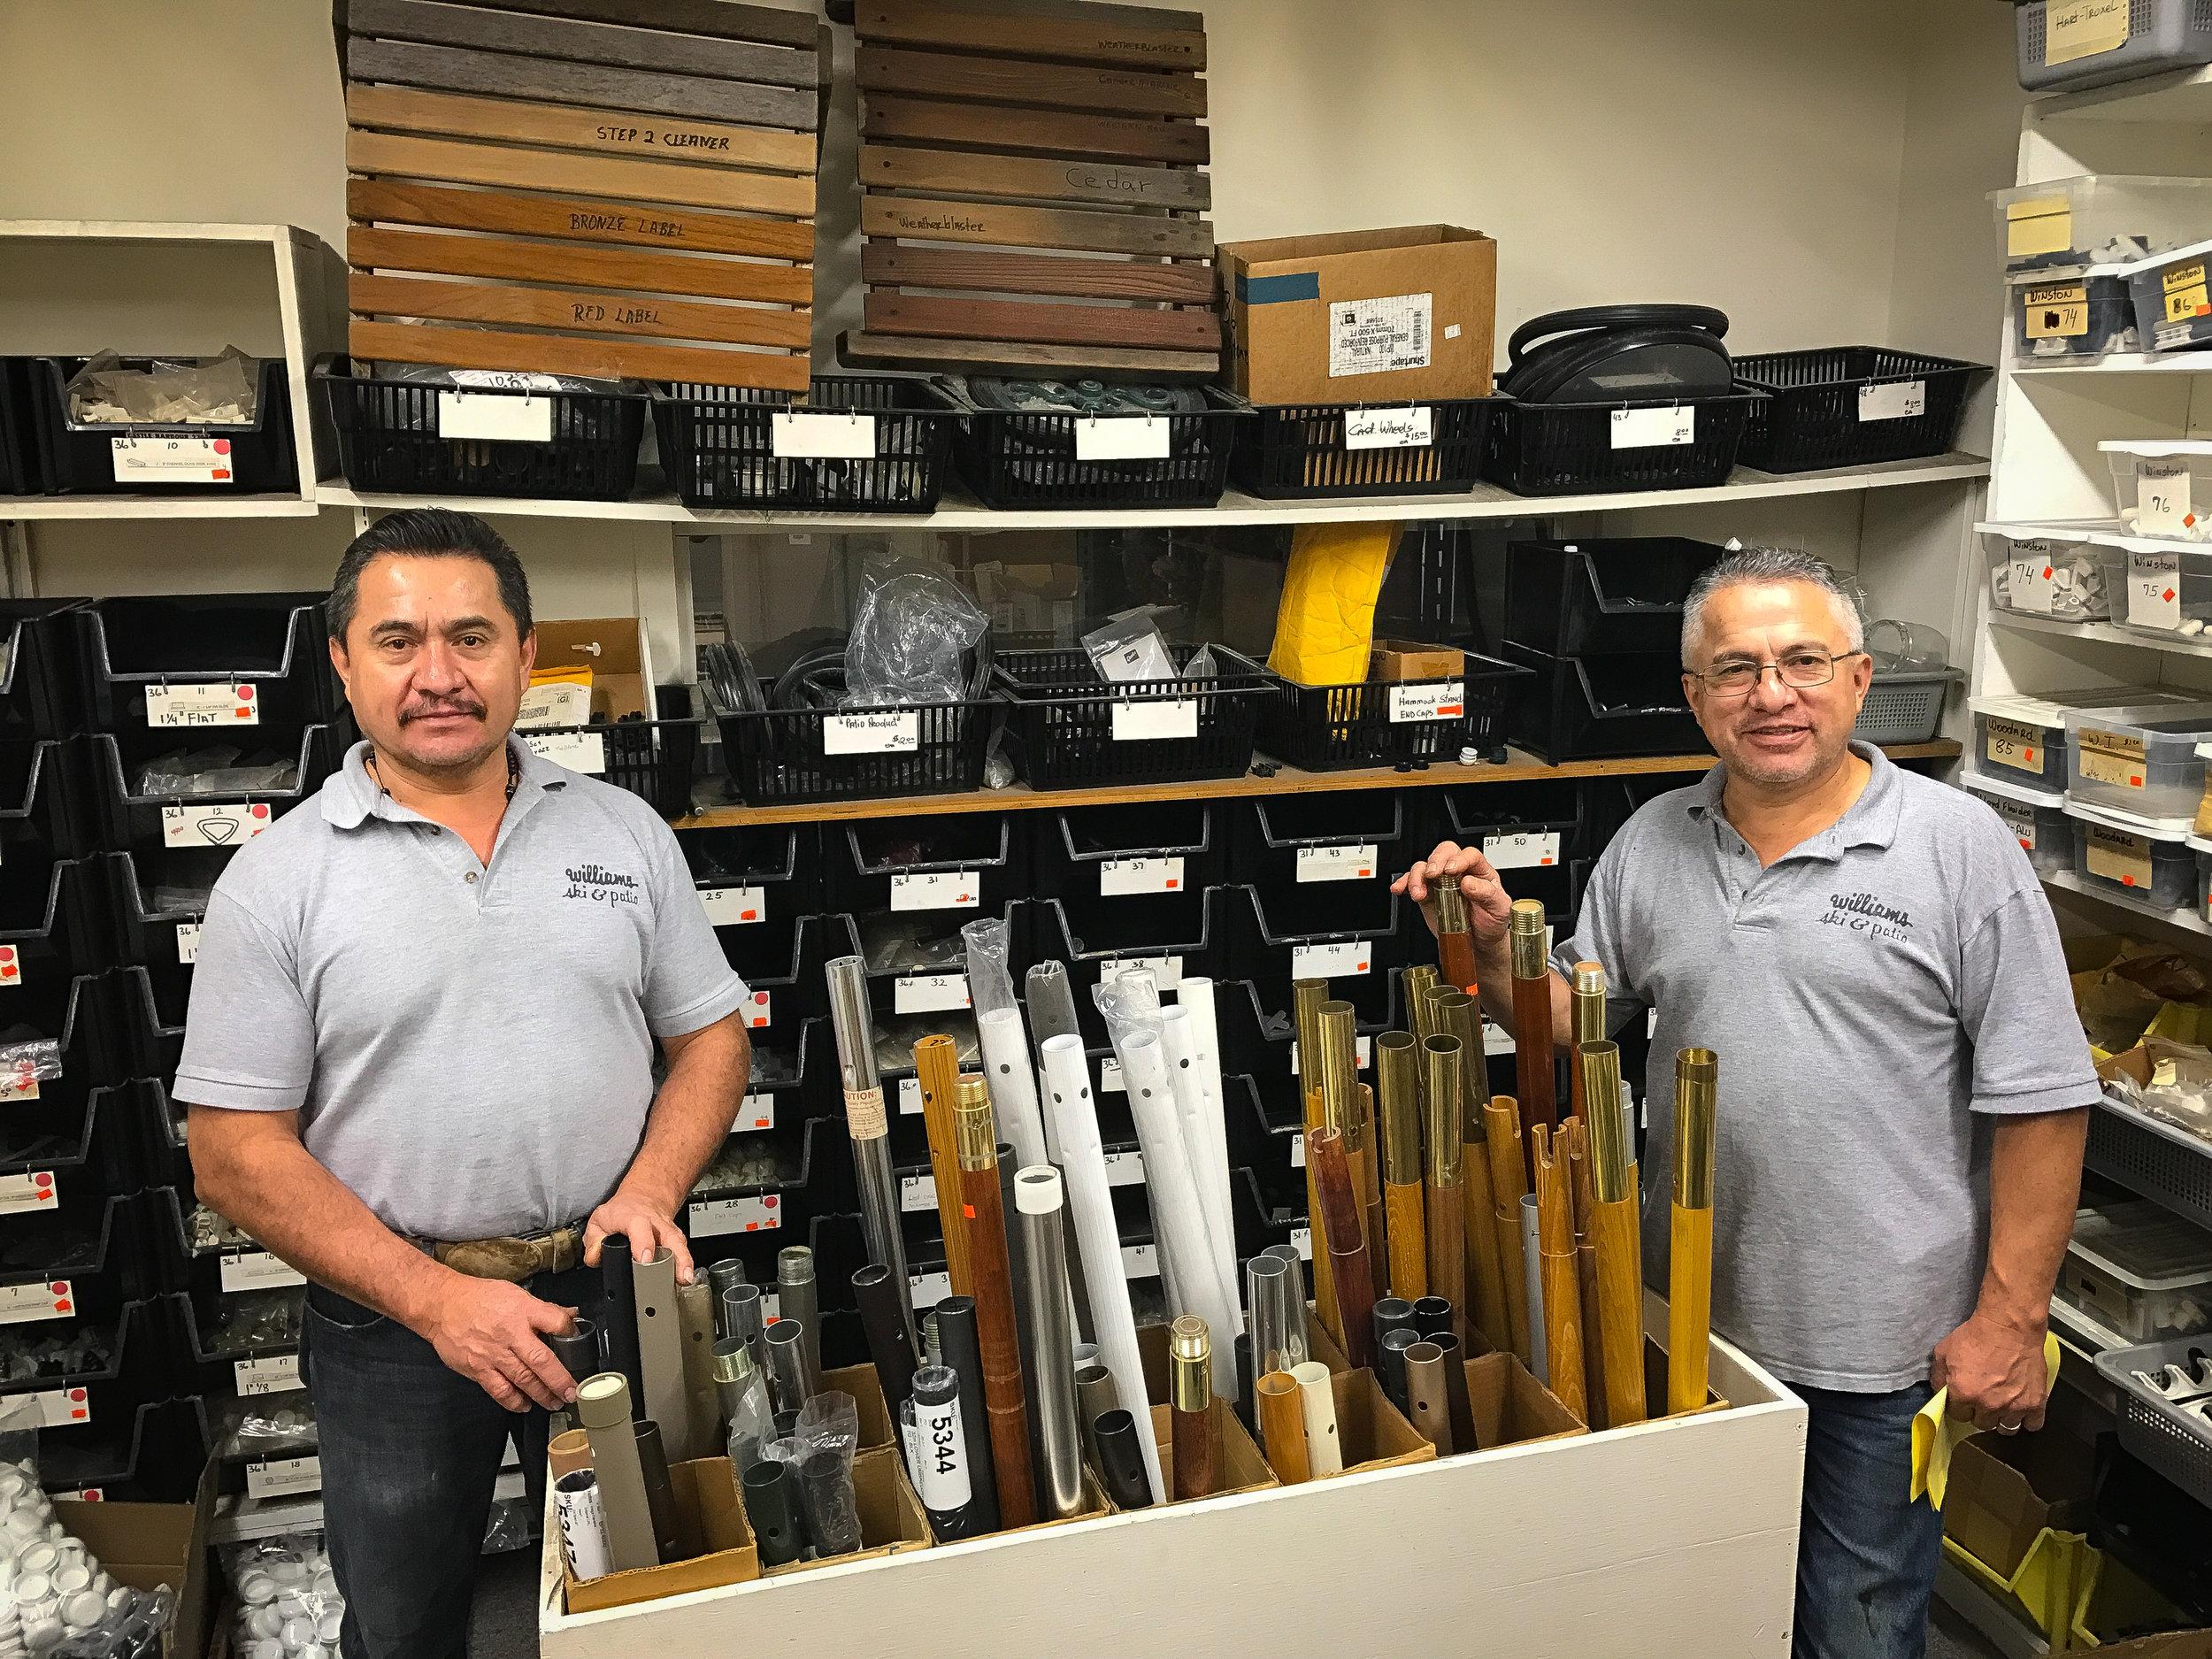 Patio furniture service team in Williams Ski and Patio parts department.